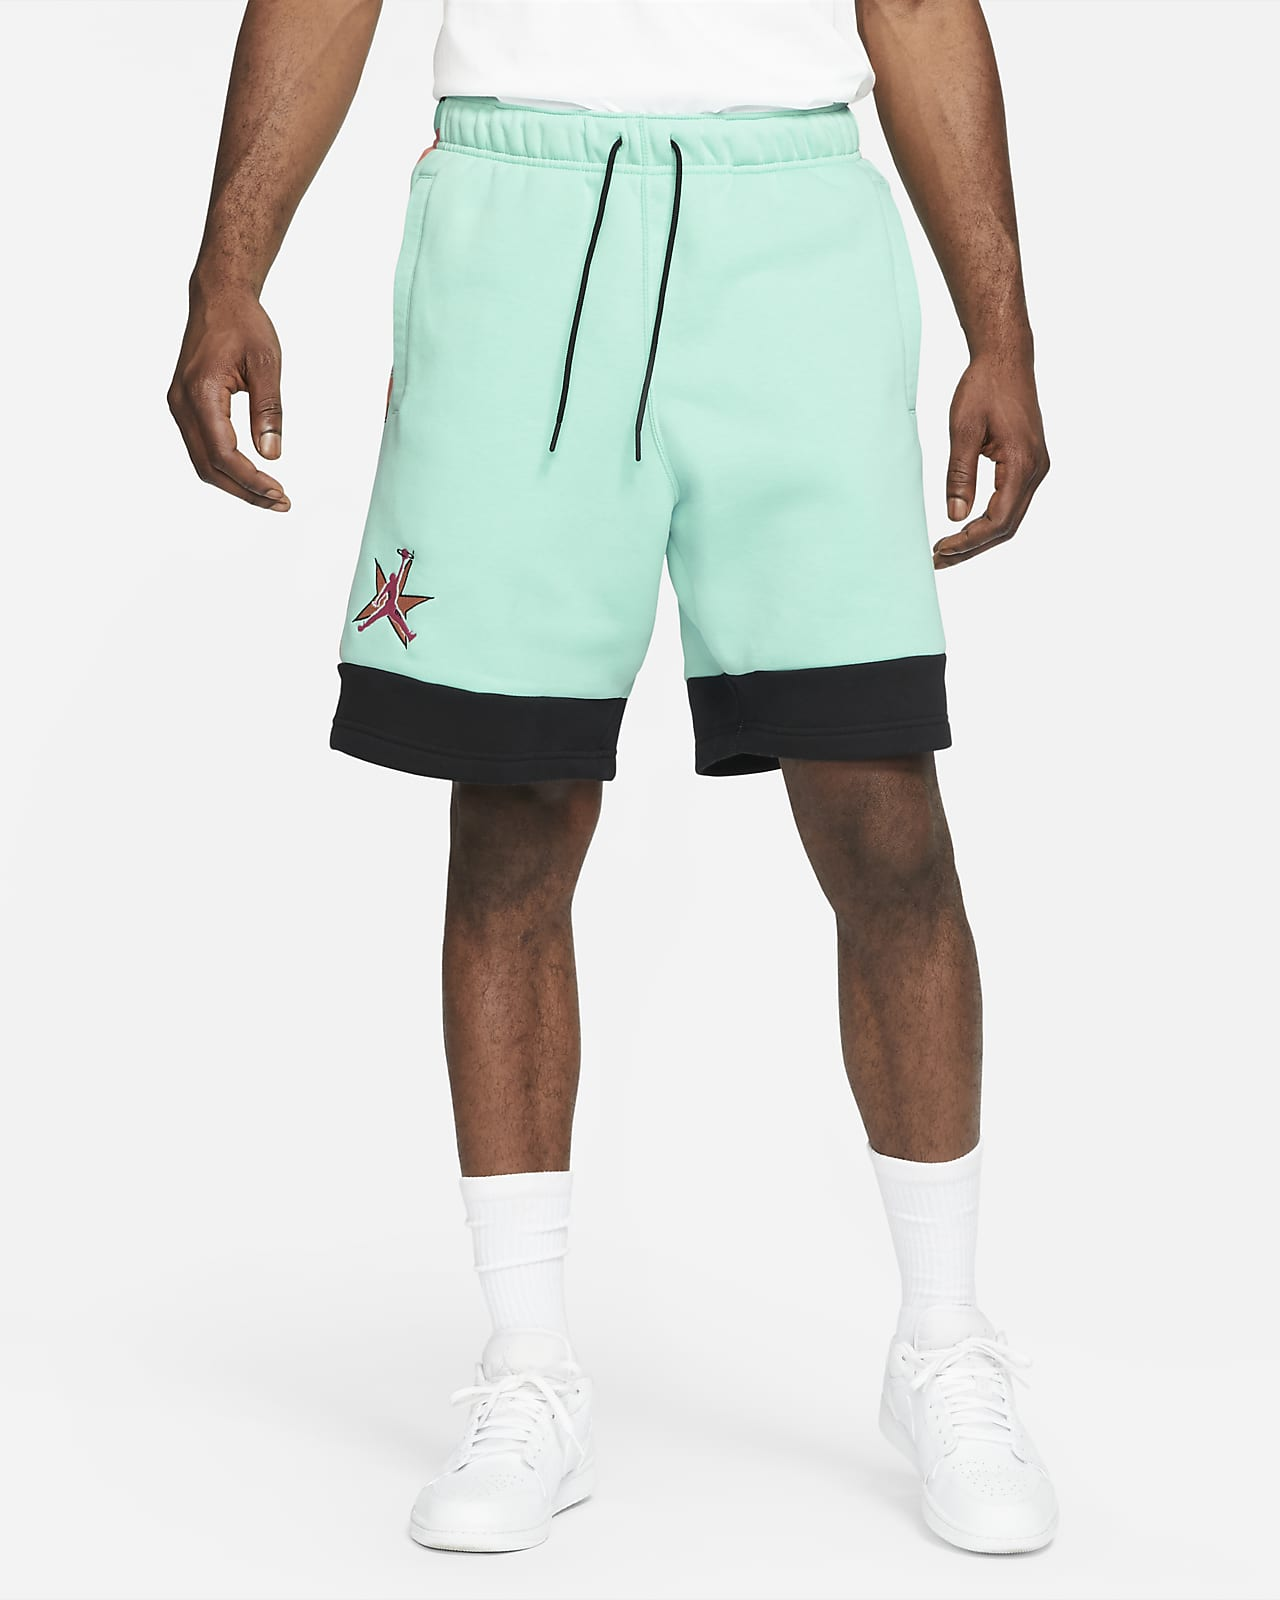 Jordan AJ11 Men's Fleece Shorts